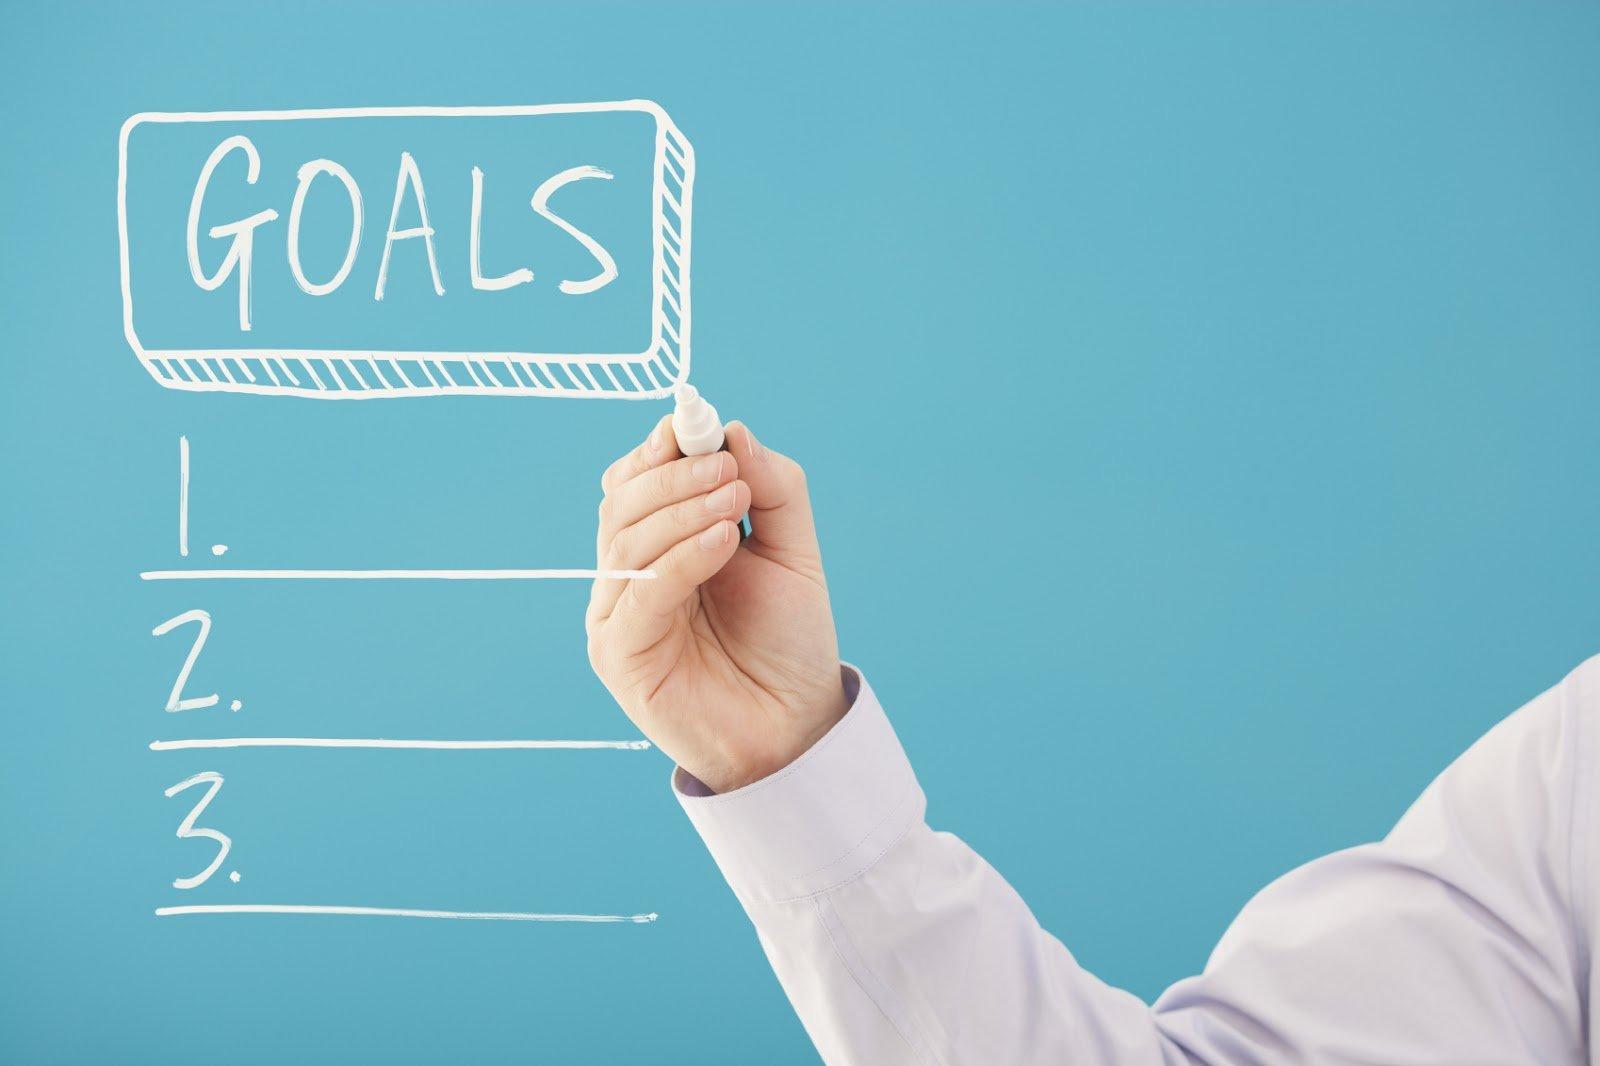 Fokus Pada BHAG (Big Hairy Audacious Goals)